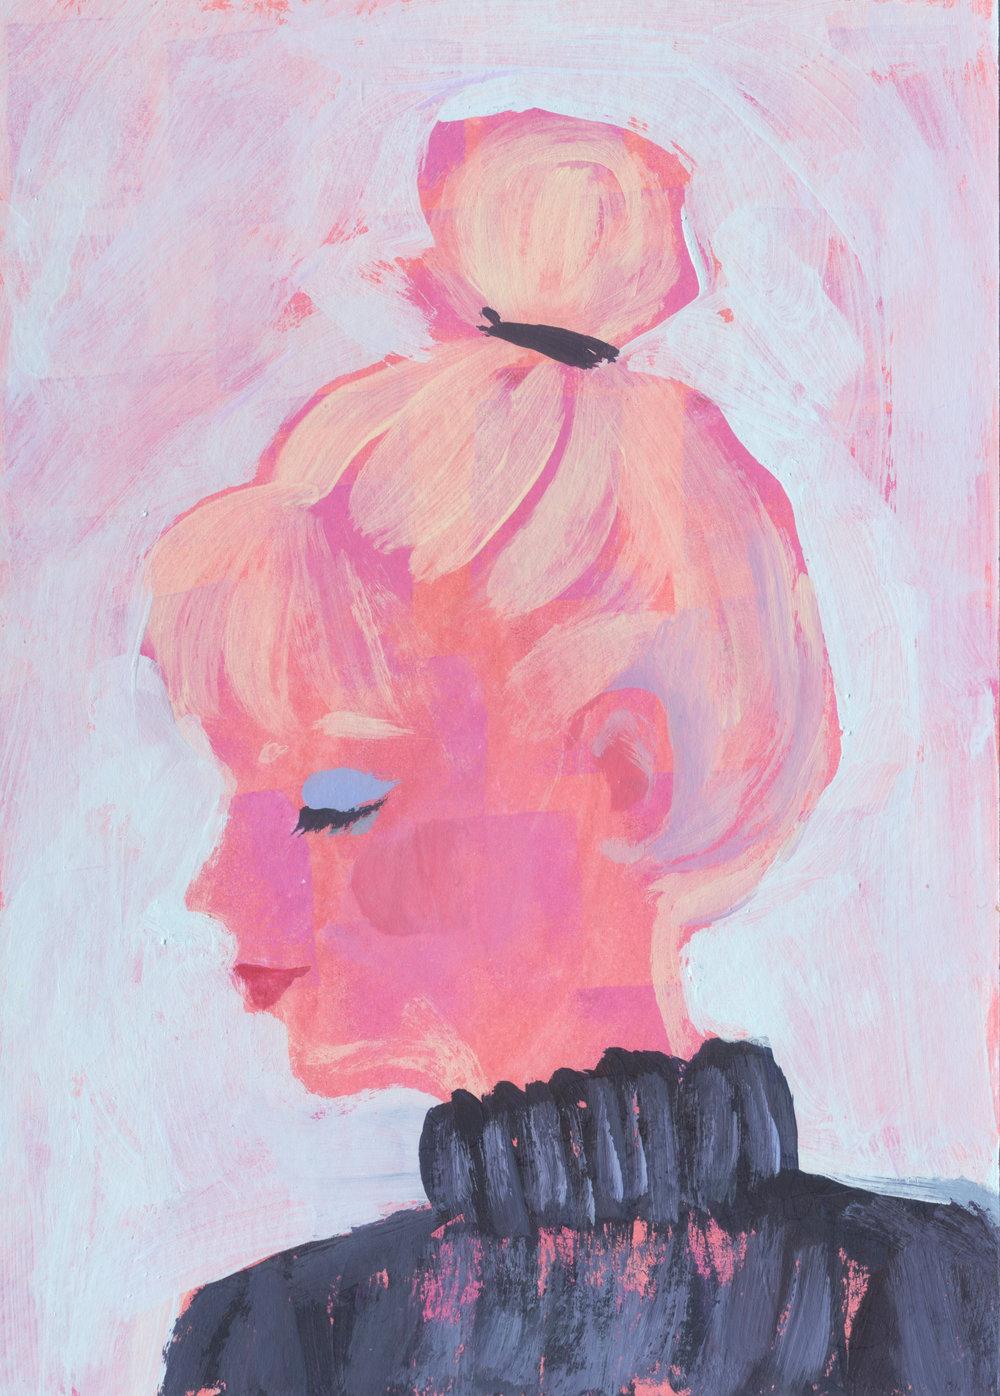 blonde-girl-in-black-jumper.jpg